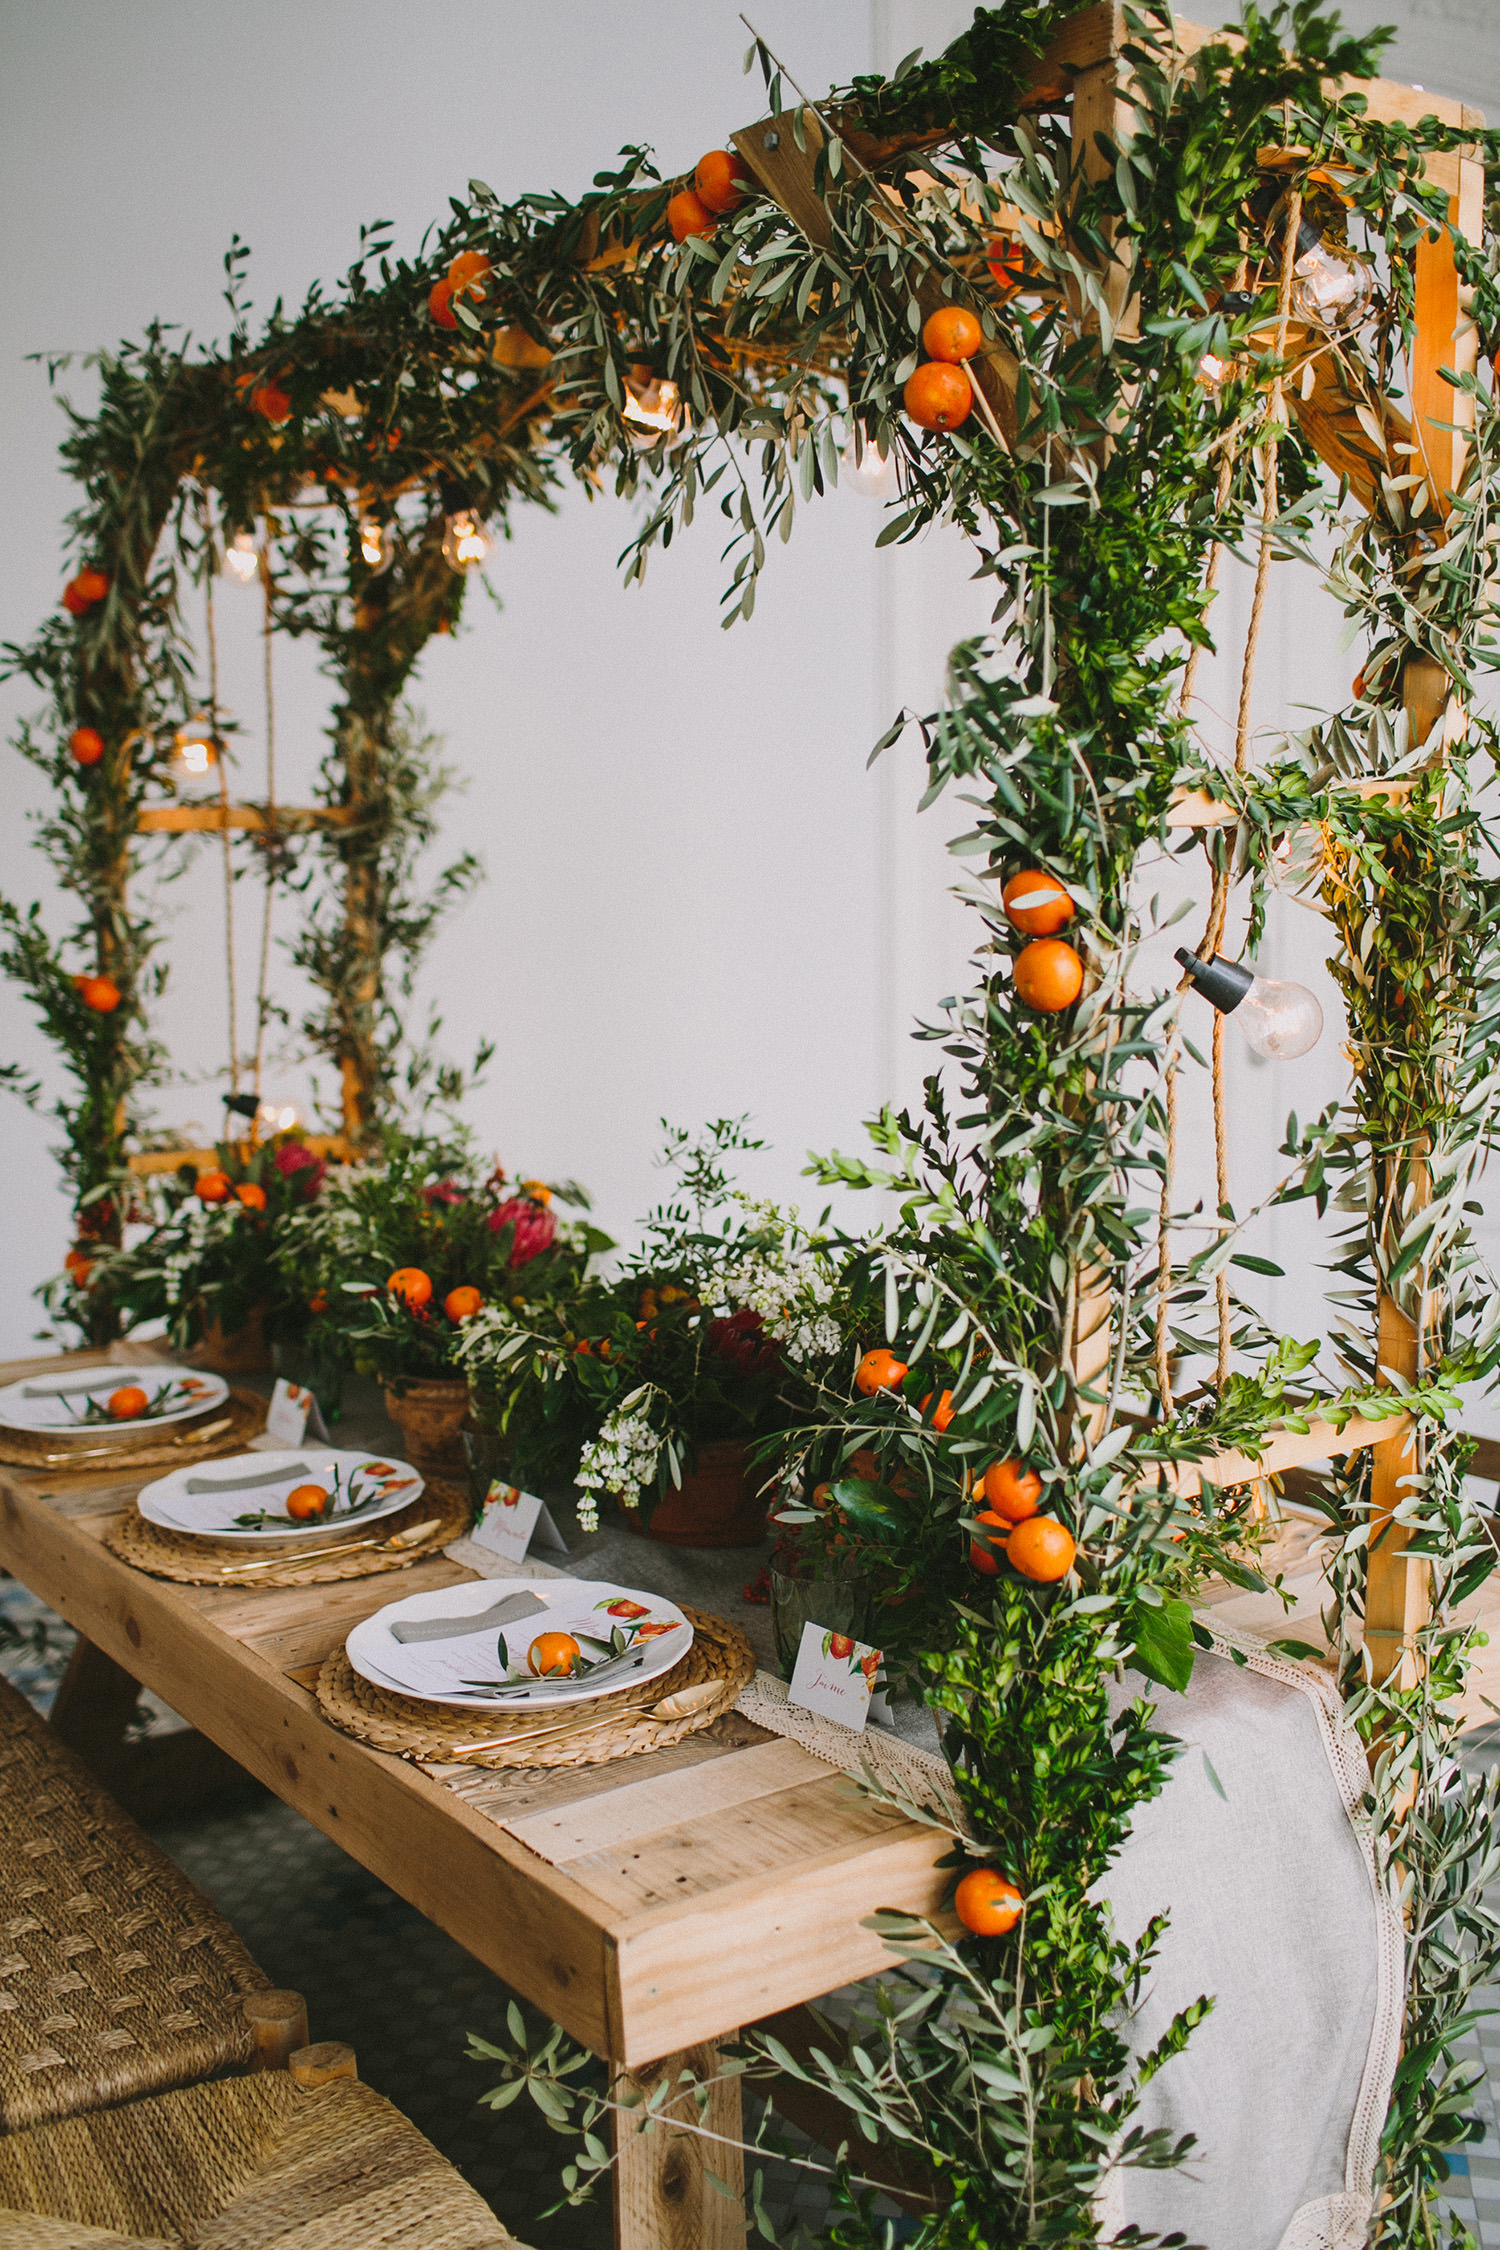 wedding reception table inspiration - photo by Paula G Furio http://ruffledblog.com/1920s-mediterranean-wedding-inspiration-in-valencia-spain